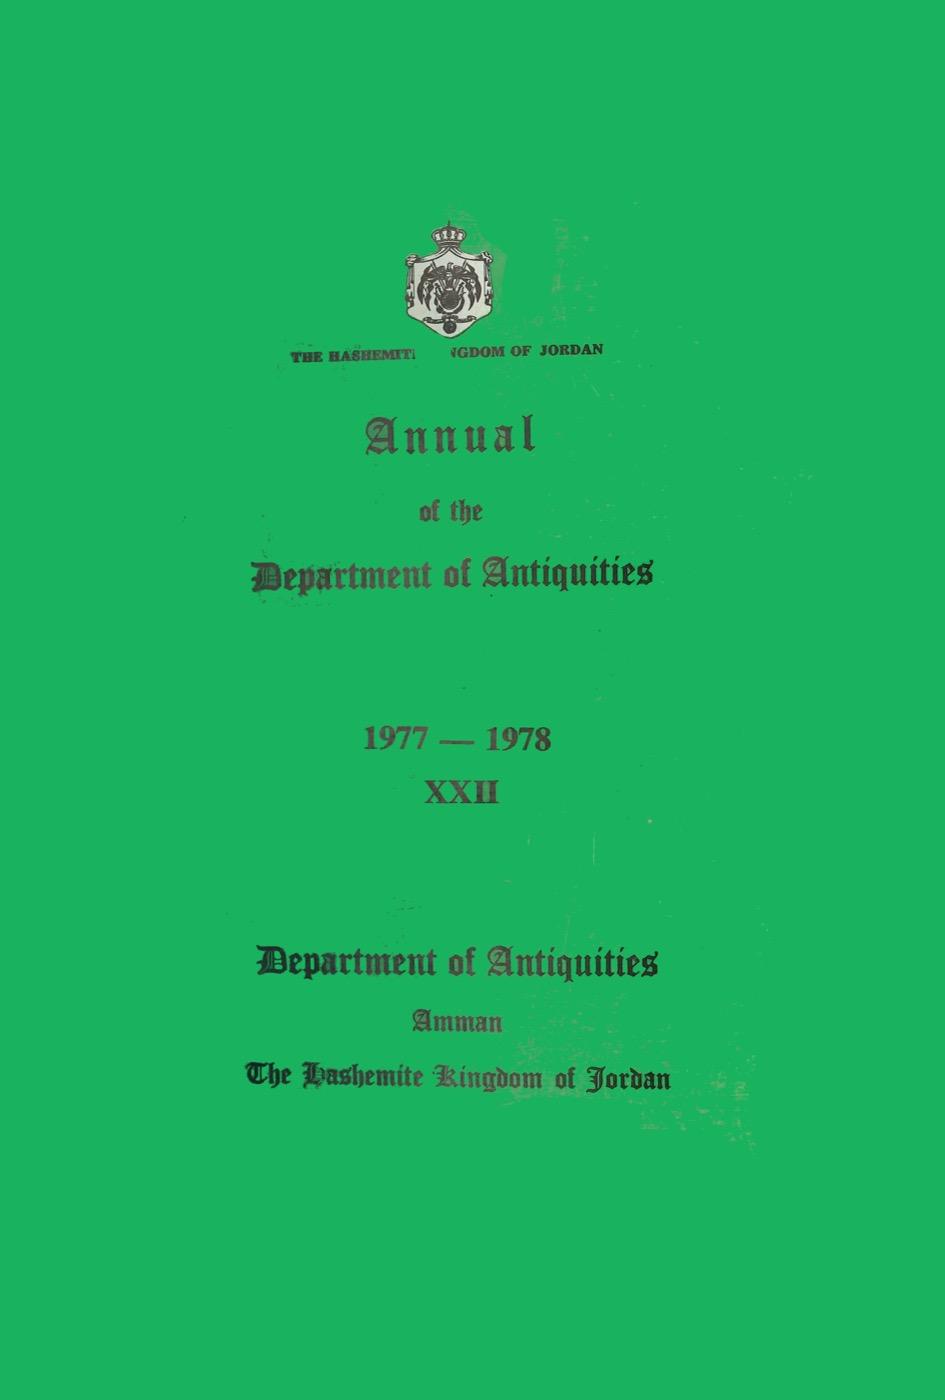 gorący produkt szybka dostawa Data wydania Annual of the Department of Antiquities of Jordan 22